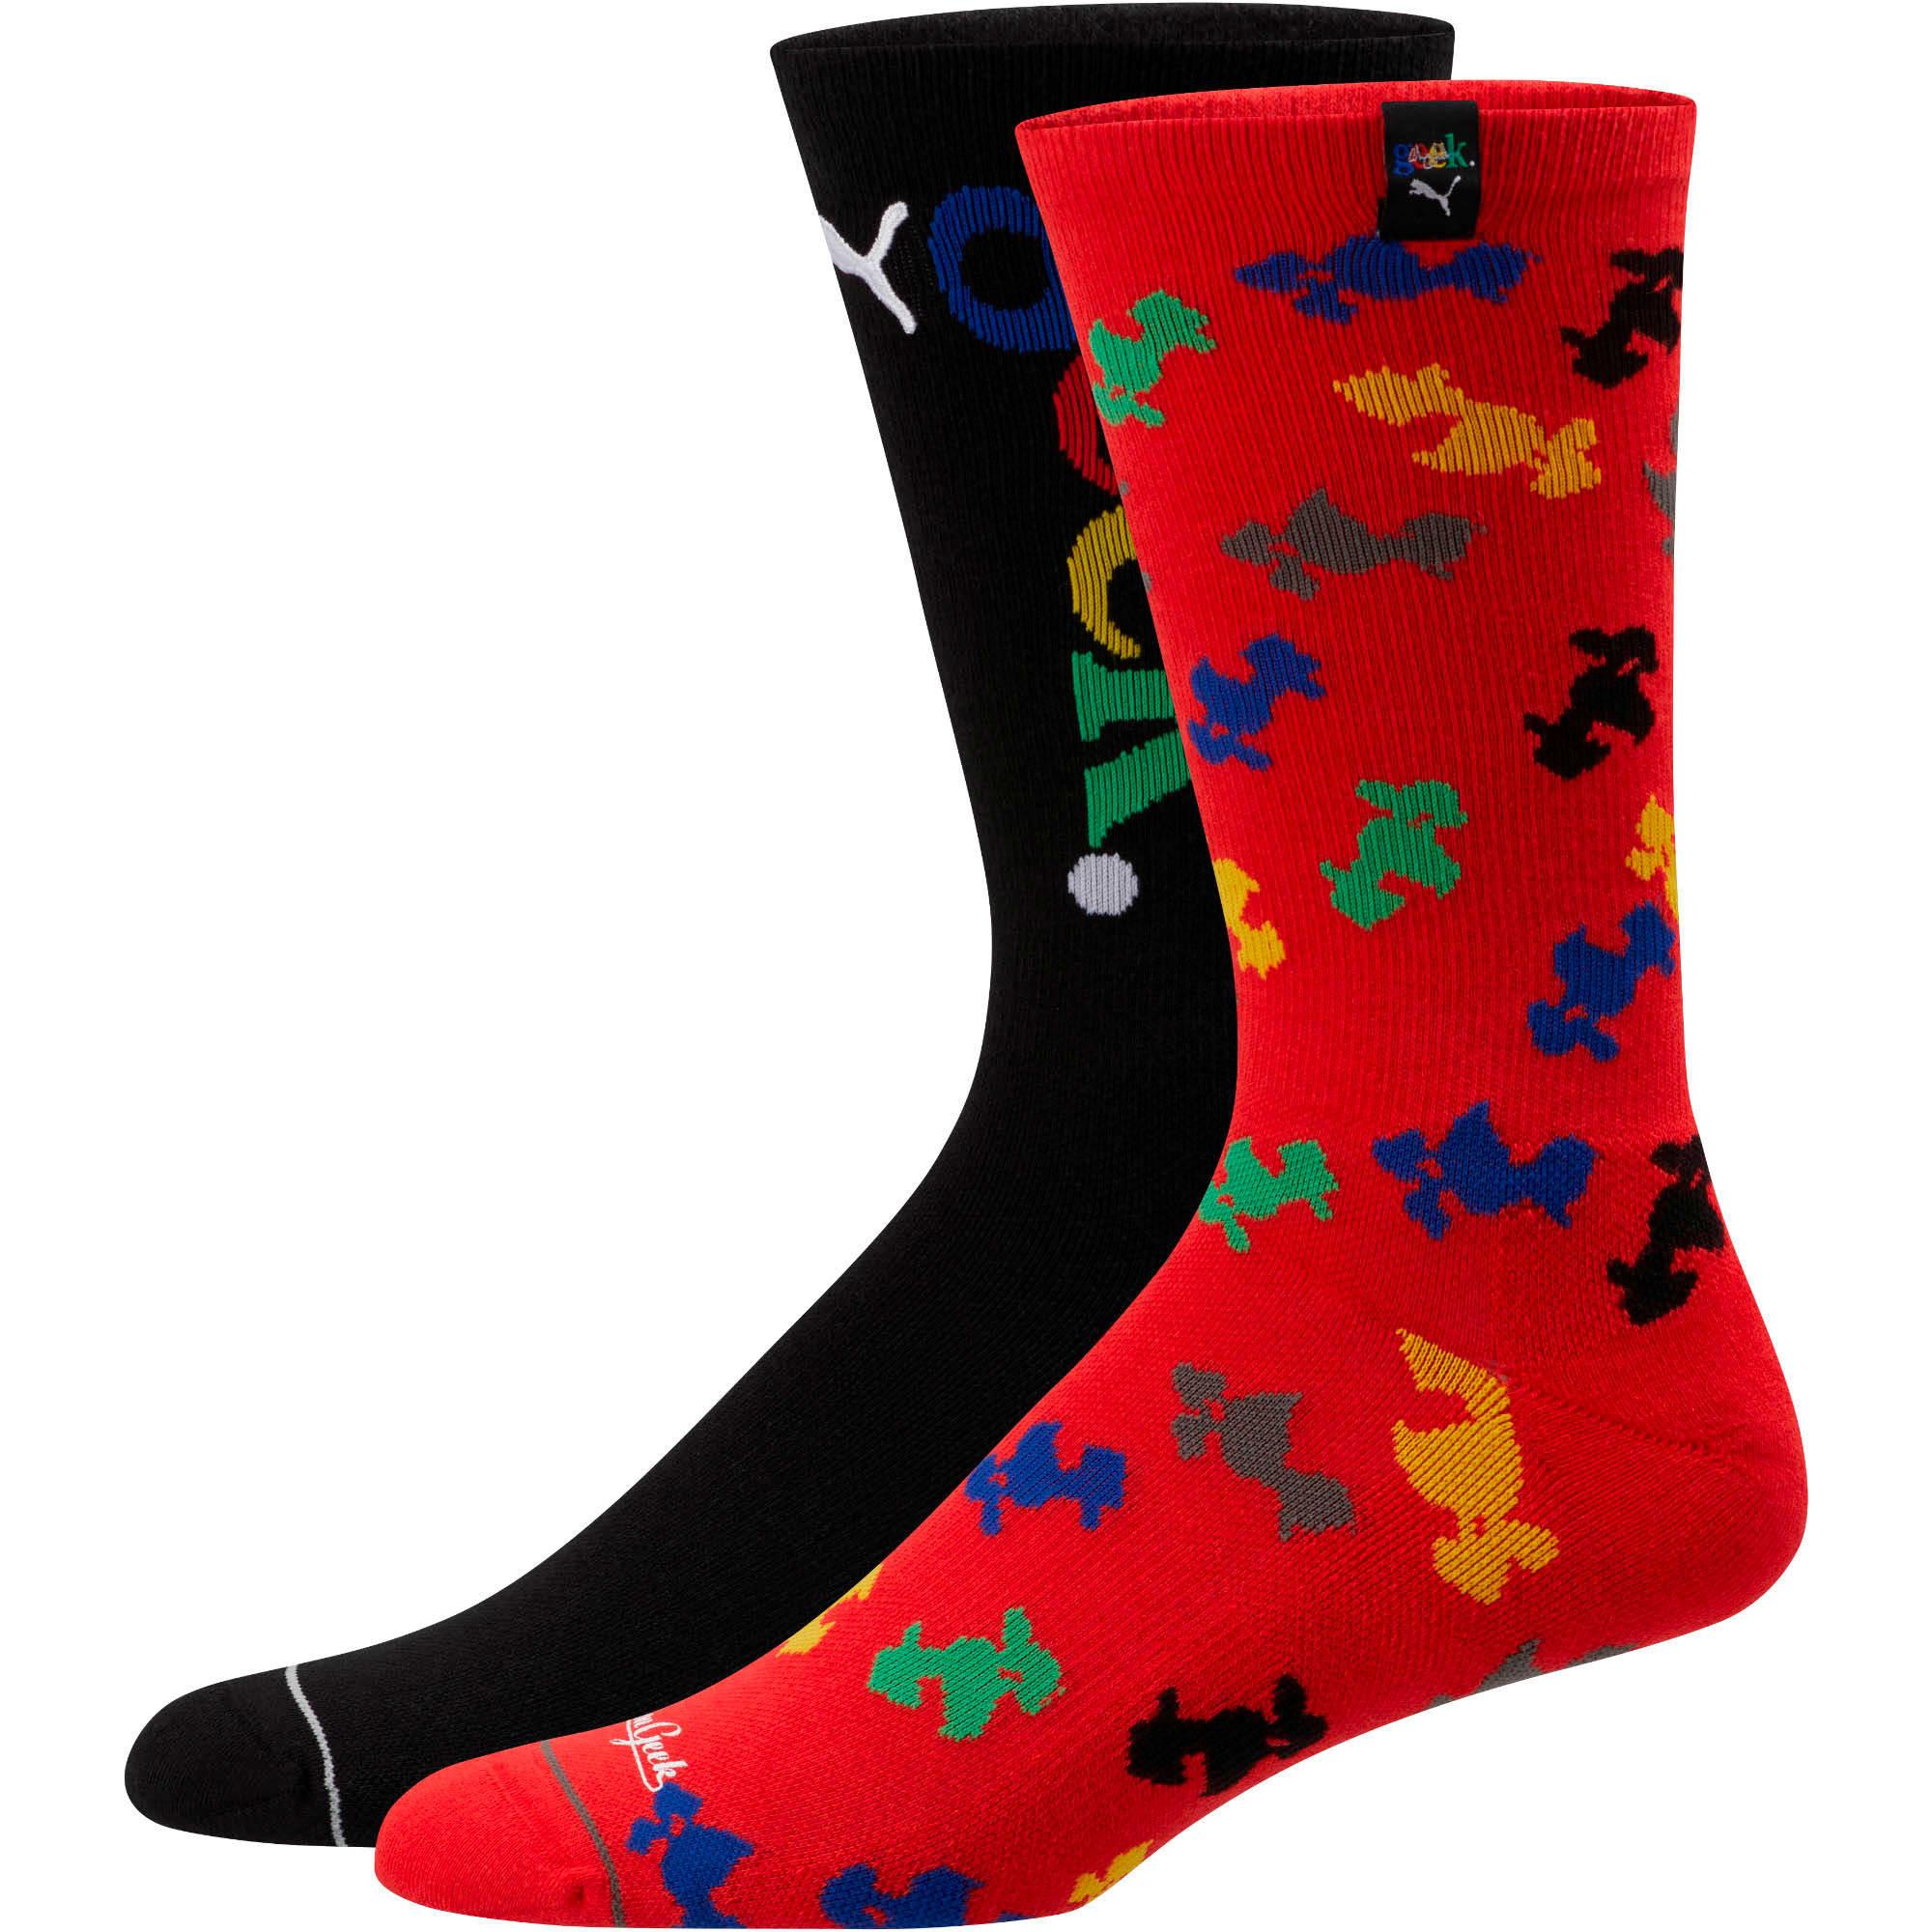 Thumbnail 1 of PUMA x FASHION GEEK Men's Crew Socks [2 Pack], BLACK, medium